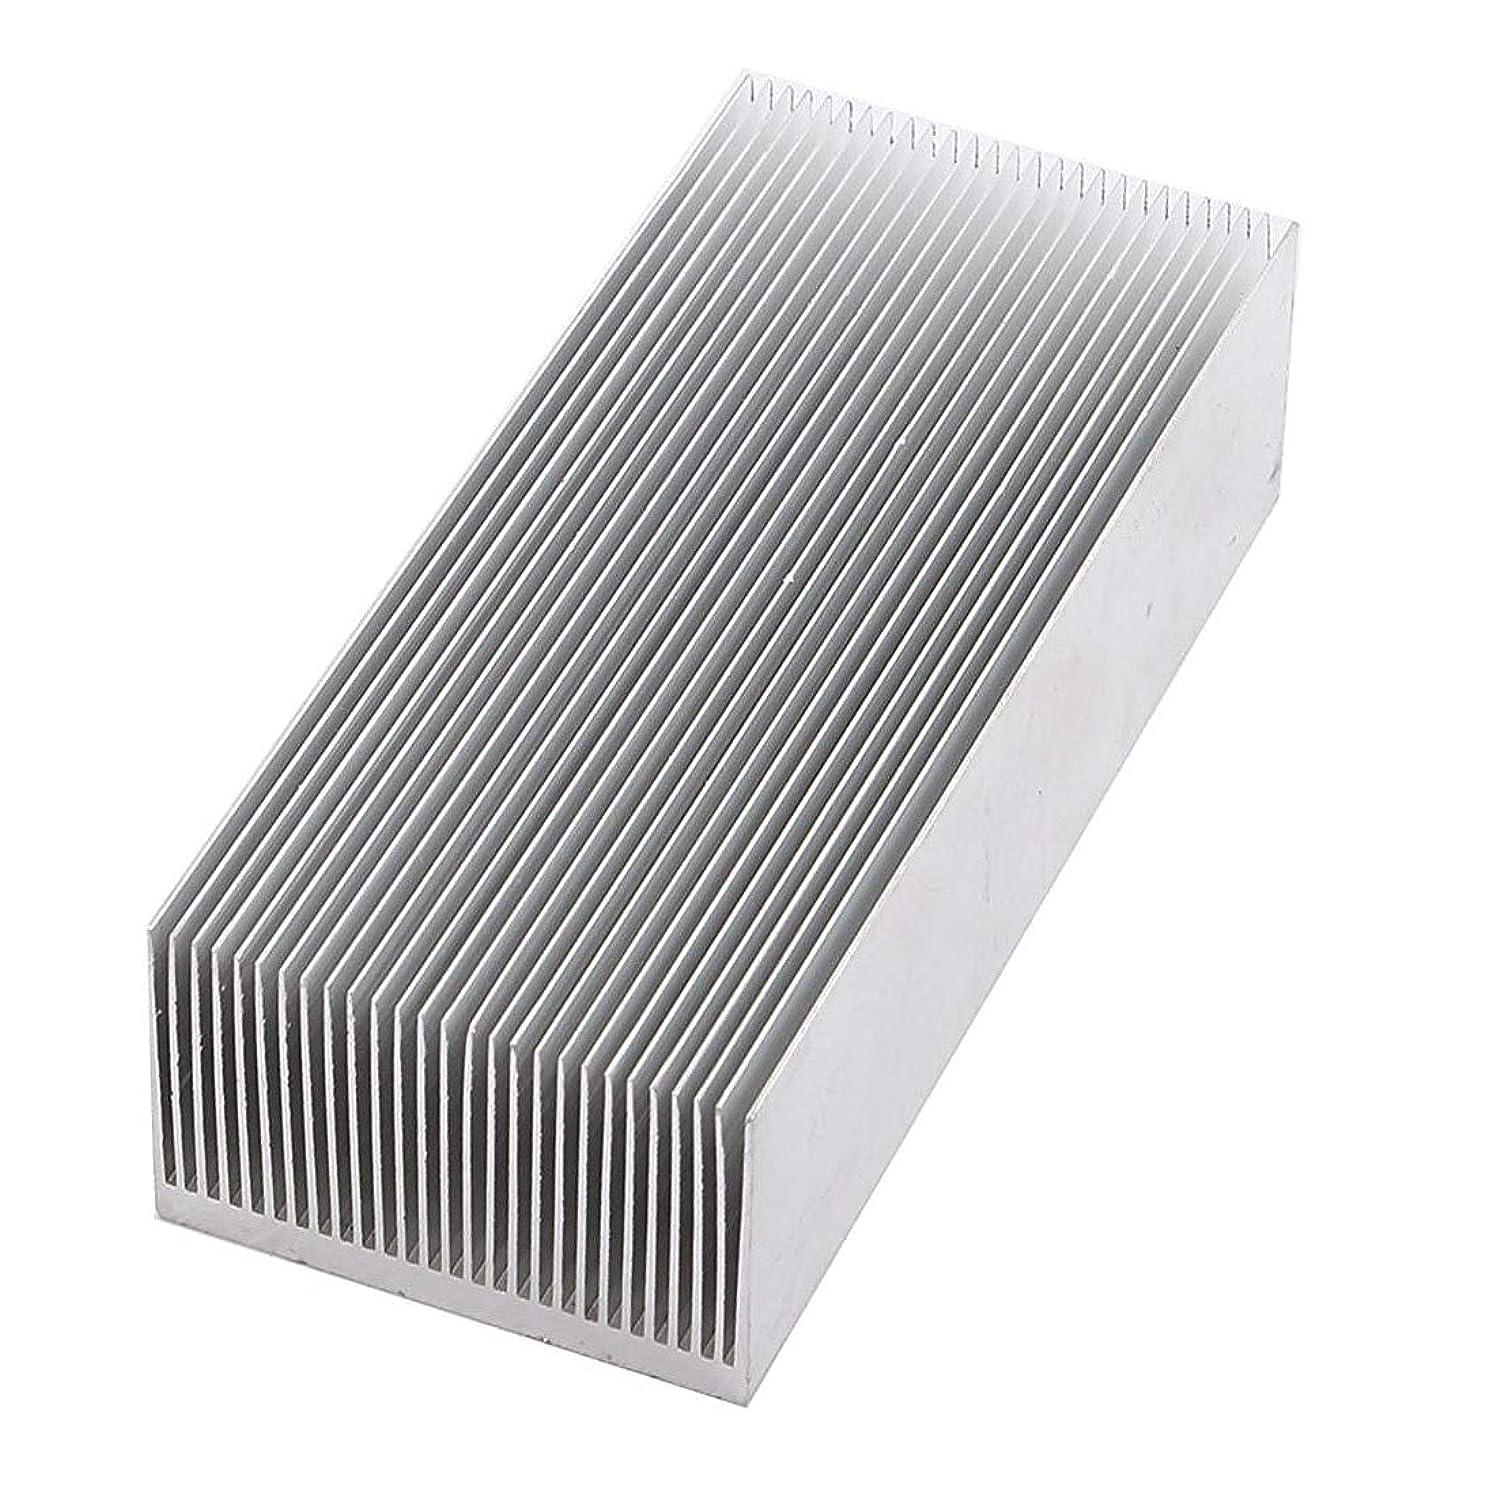 Ants-Store - Aluminum Heat Radiator Heatsink Cooling Fin 150x69x37mm Silver Tone